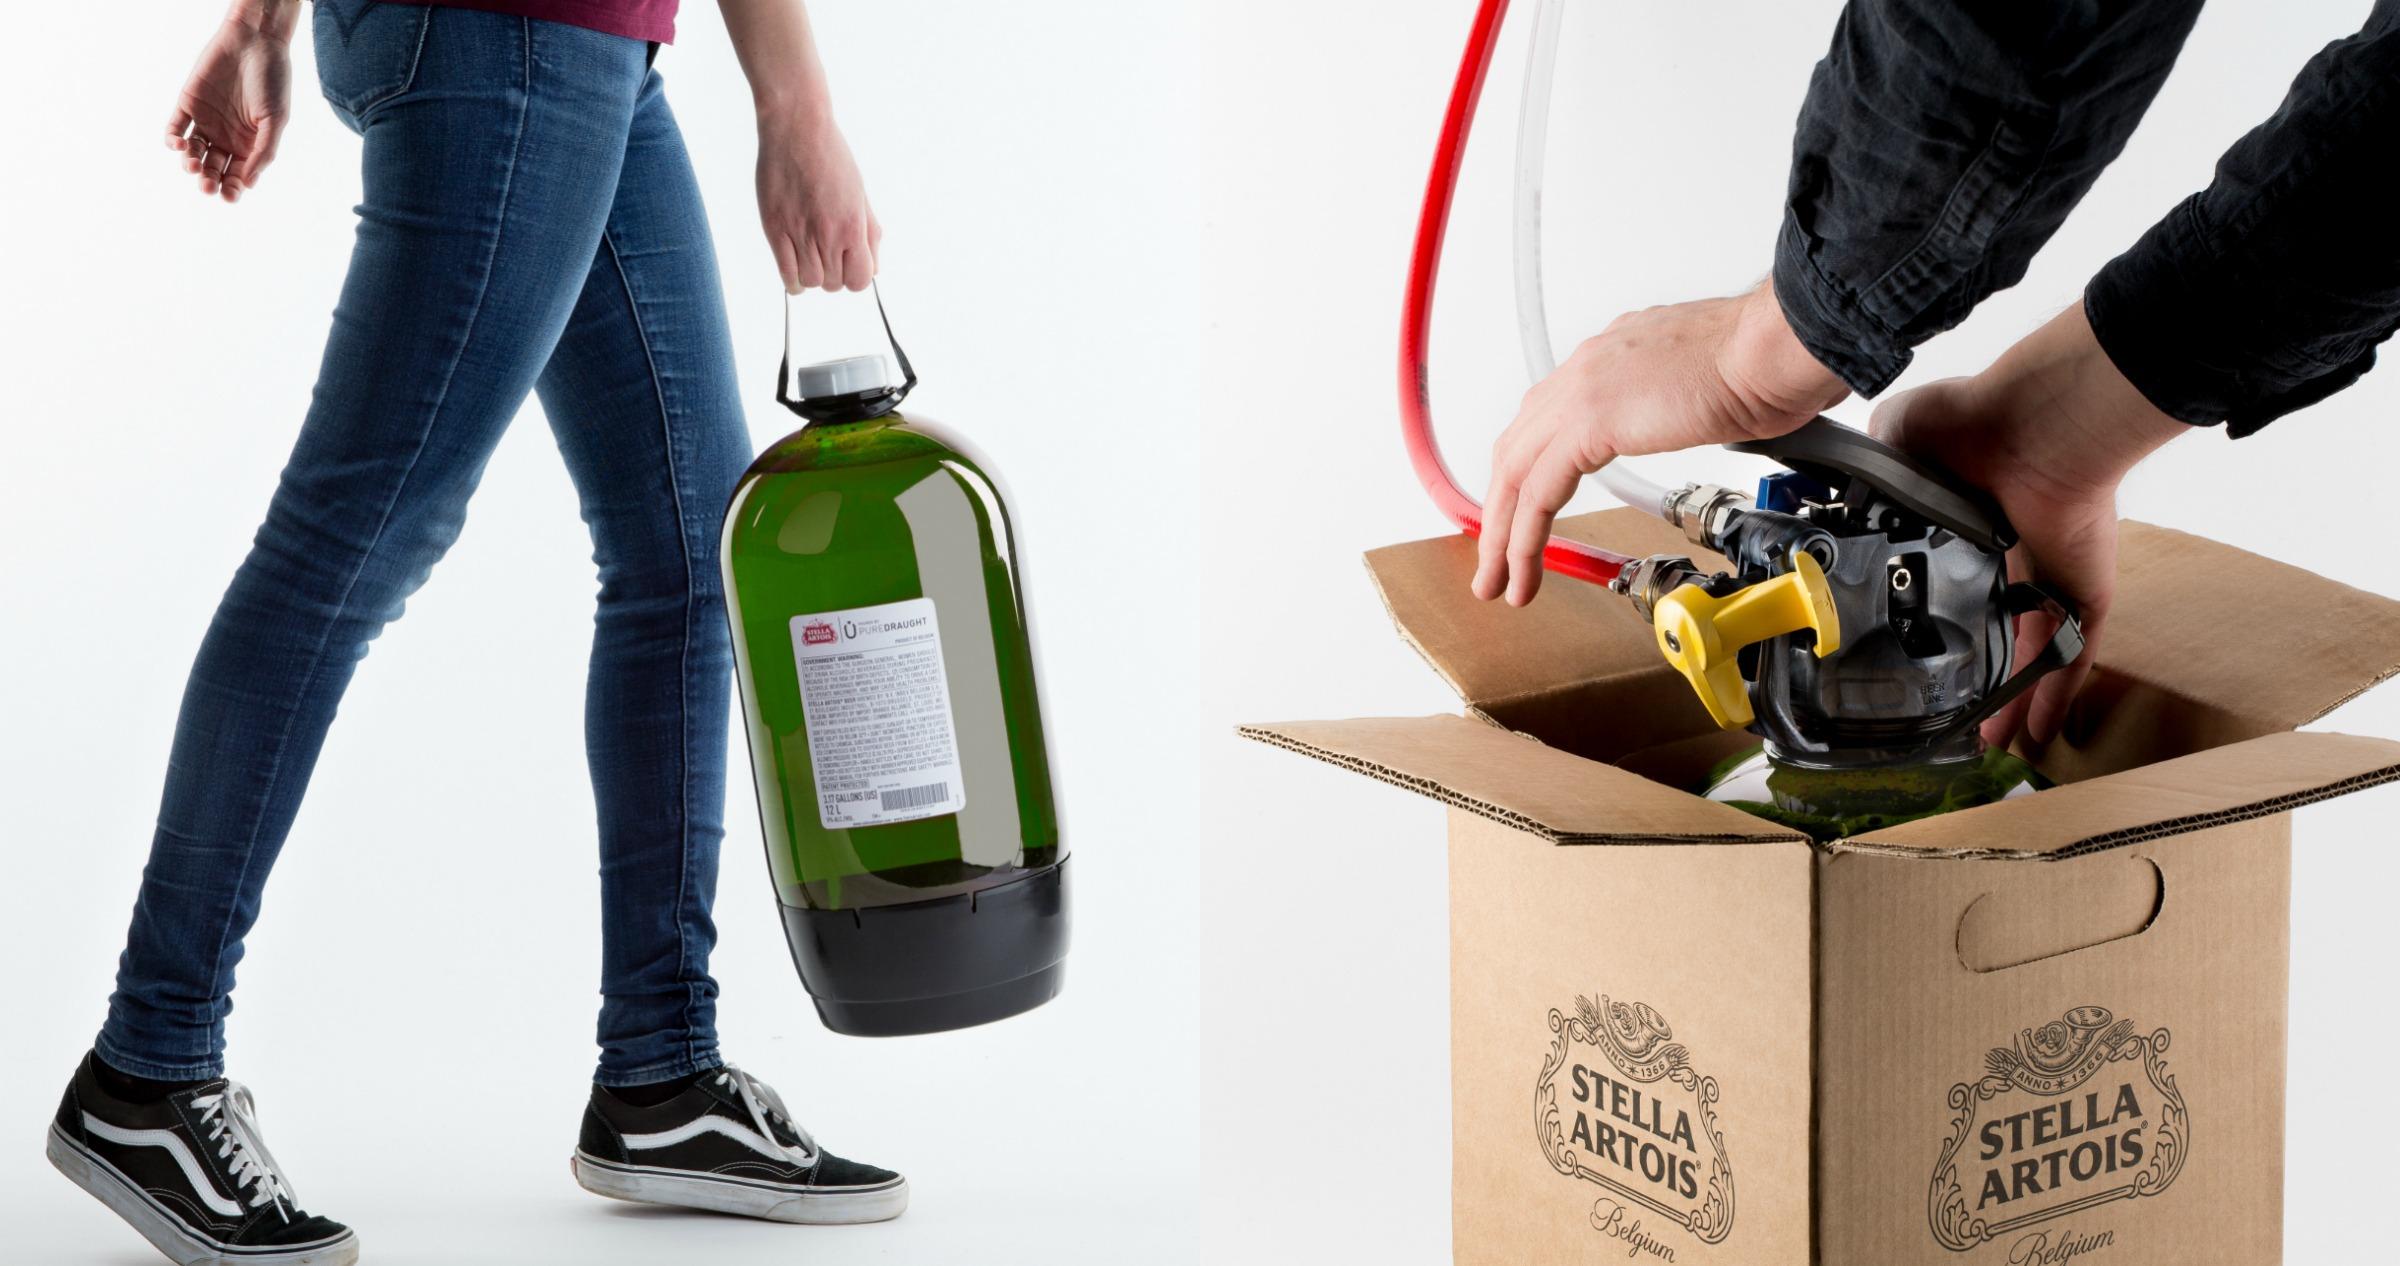 AB InBev introduces PureDraught polymer keg system